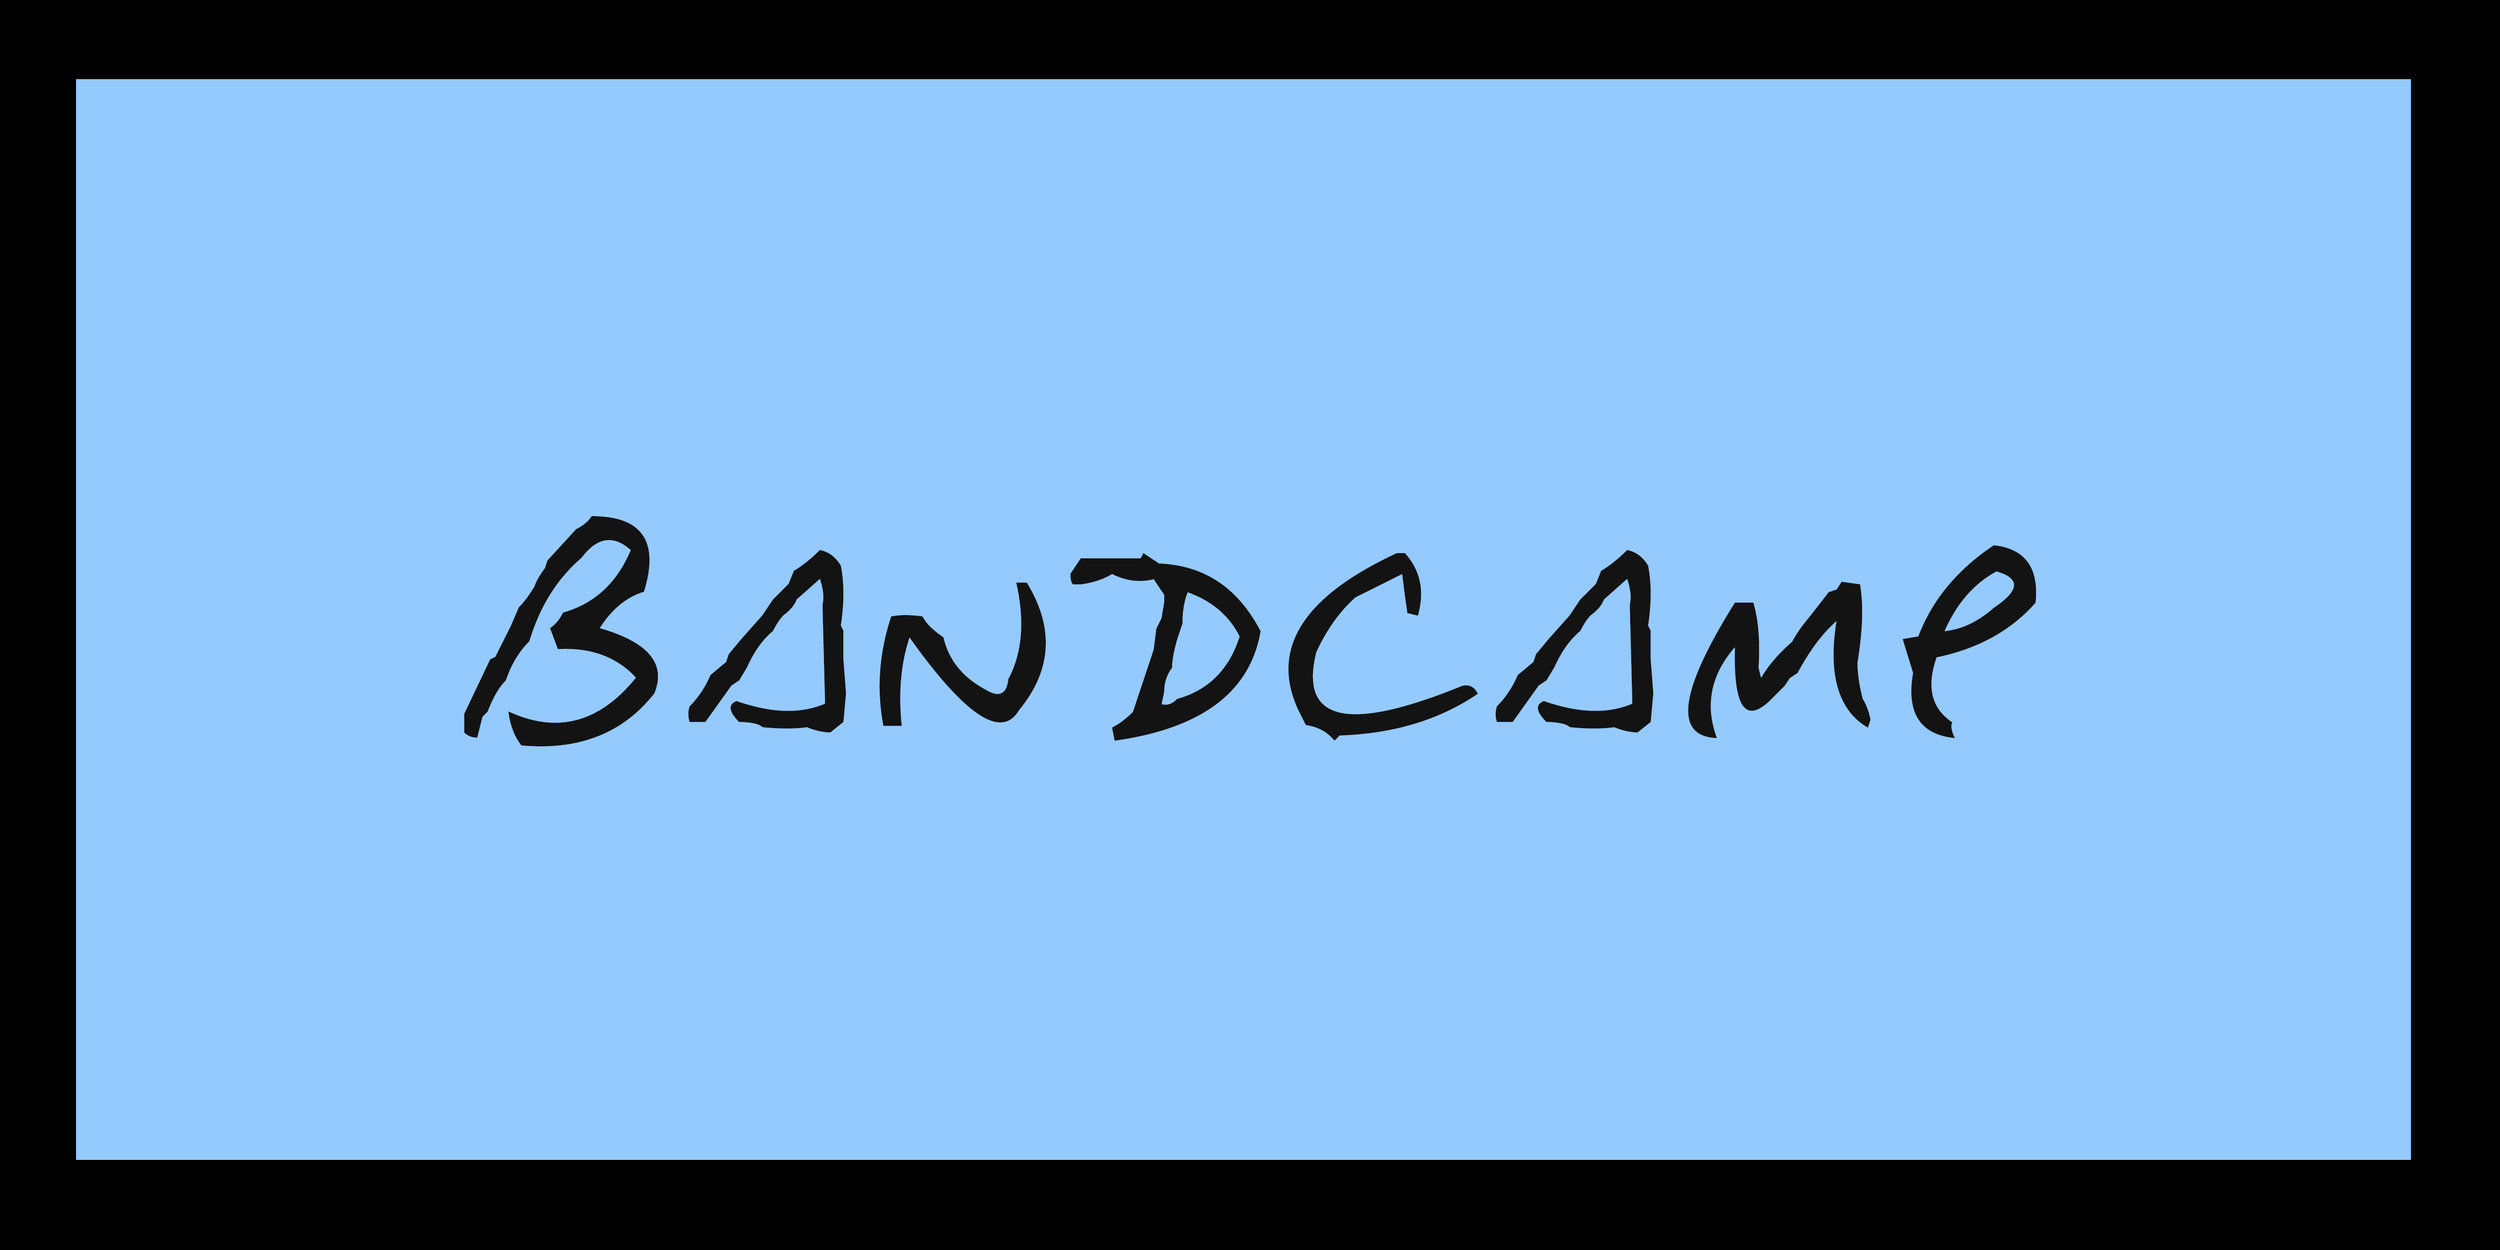 BandcampButton.jpg